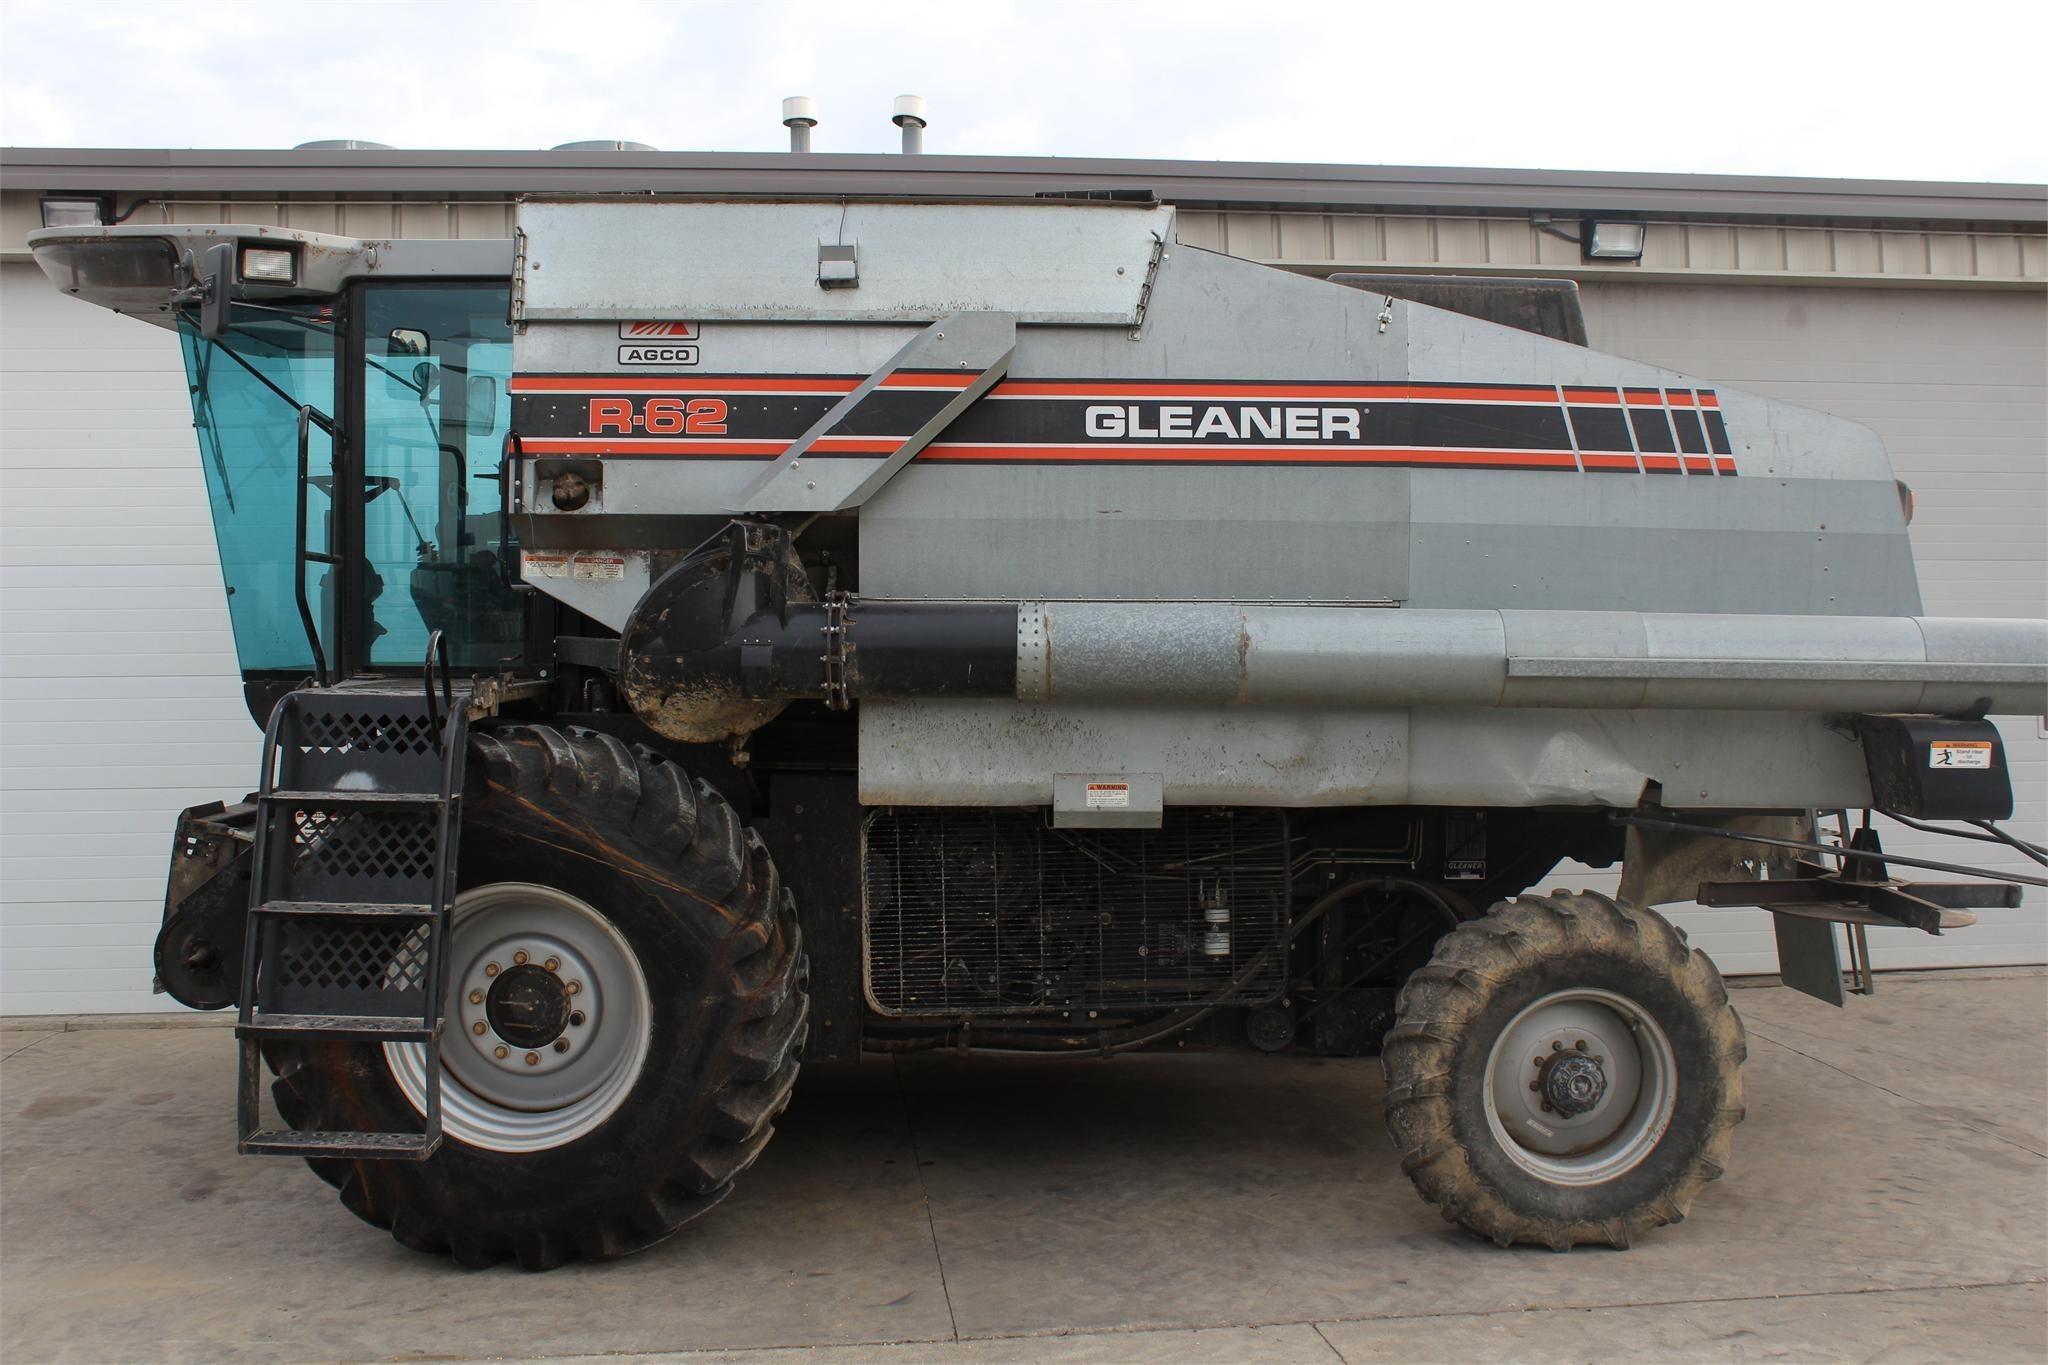 1995 Gleaner R62 Combine